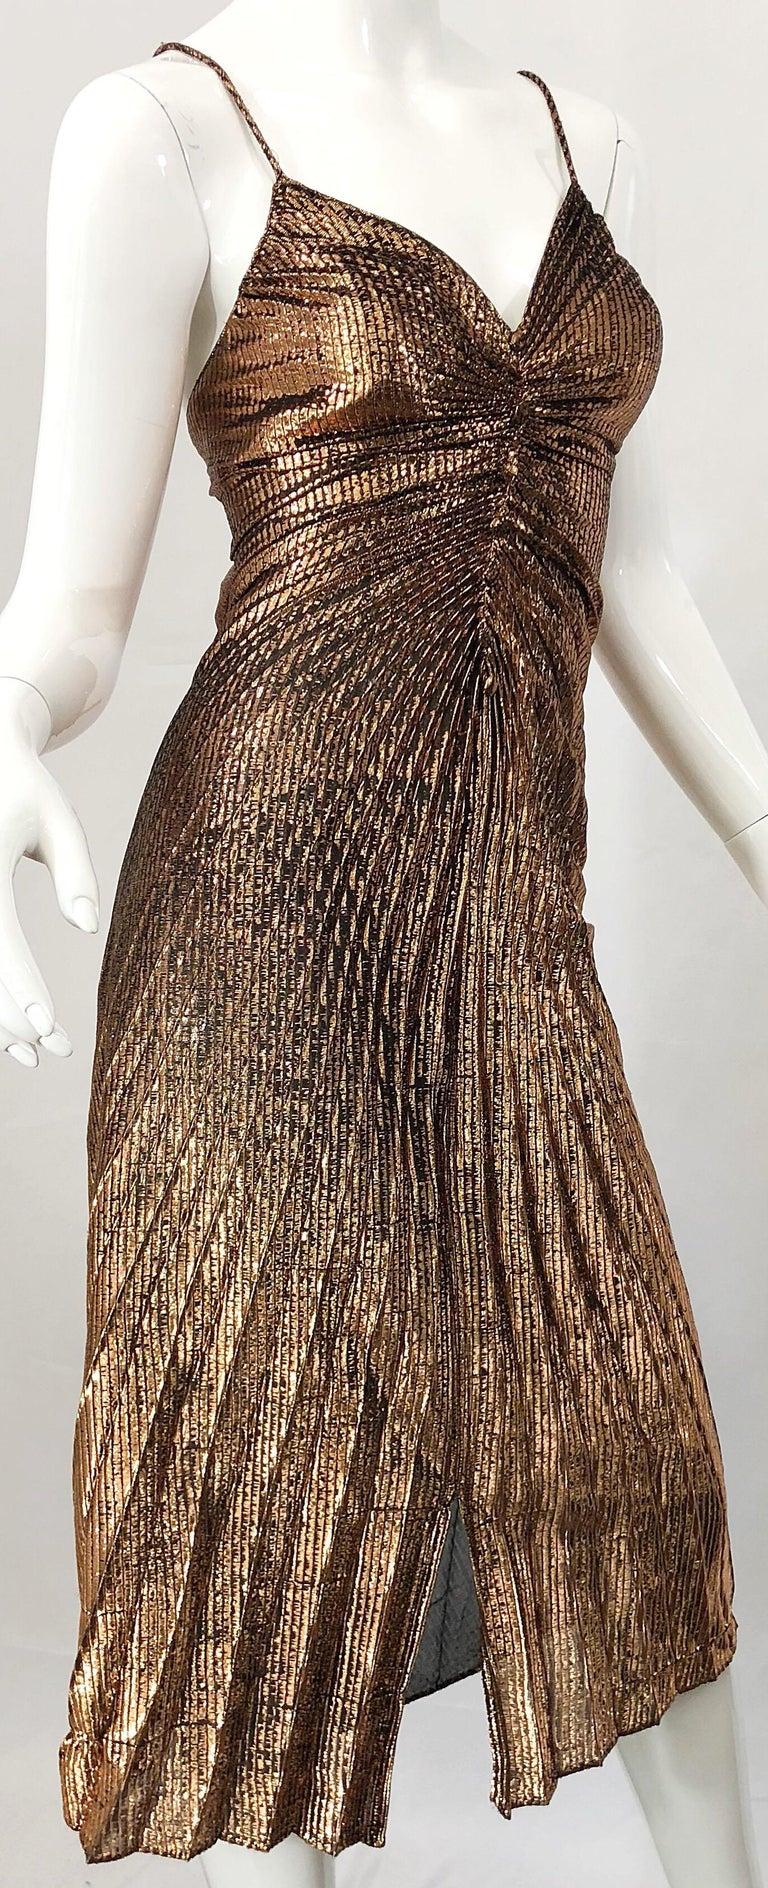 1970s Samir Sexy Golden Bronze Pleated Disco Studio 54 Slinky Vintage 70s Dress For Sale 6